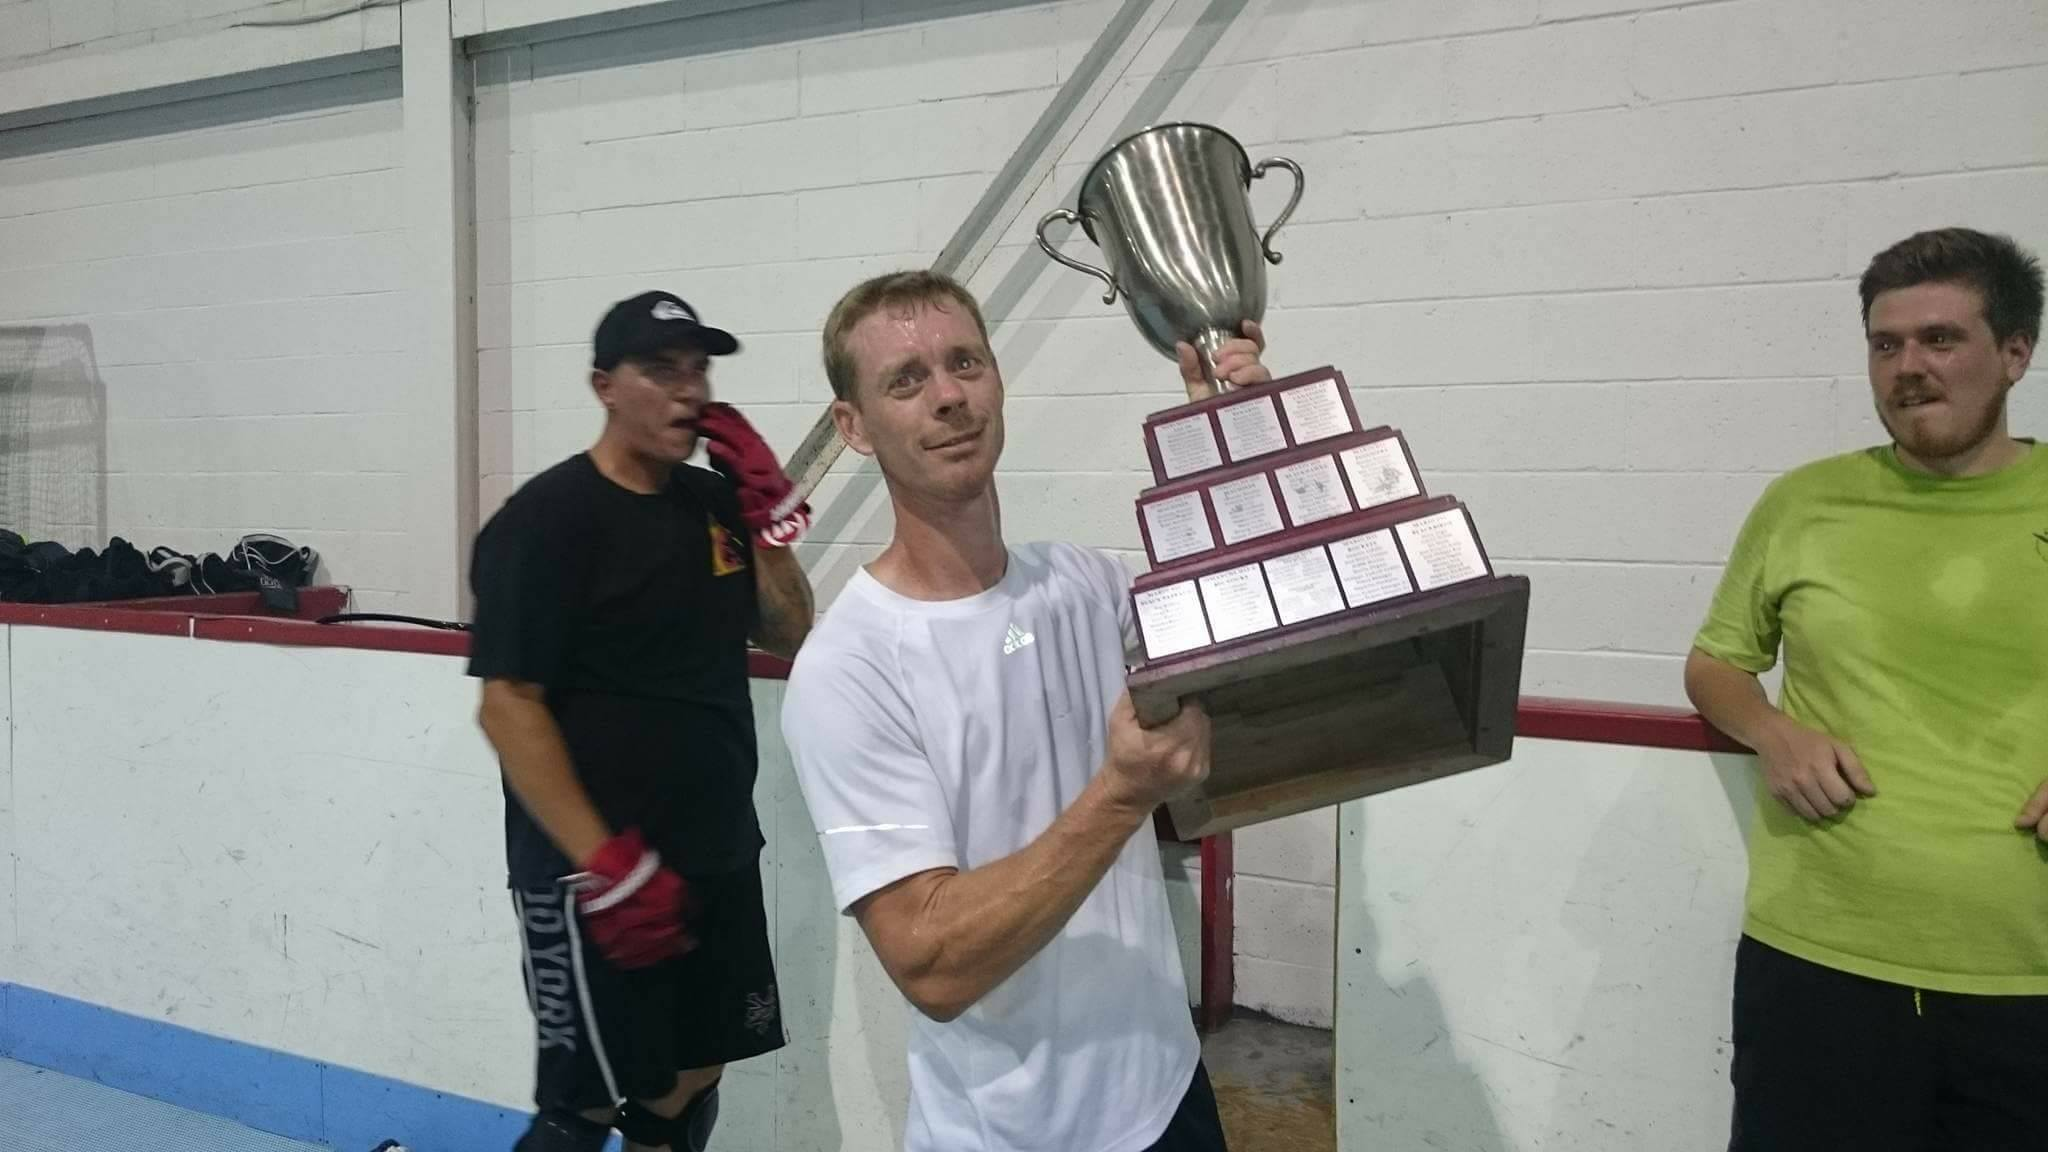 Champions_hockey_cosom_hockey_balle_printemps_2017 (4)